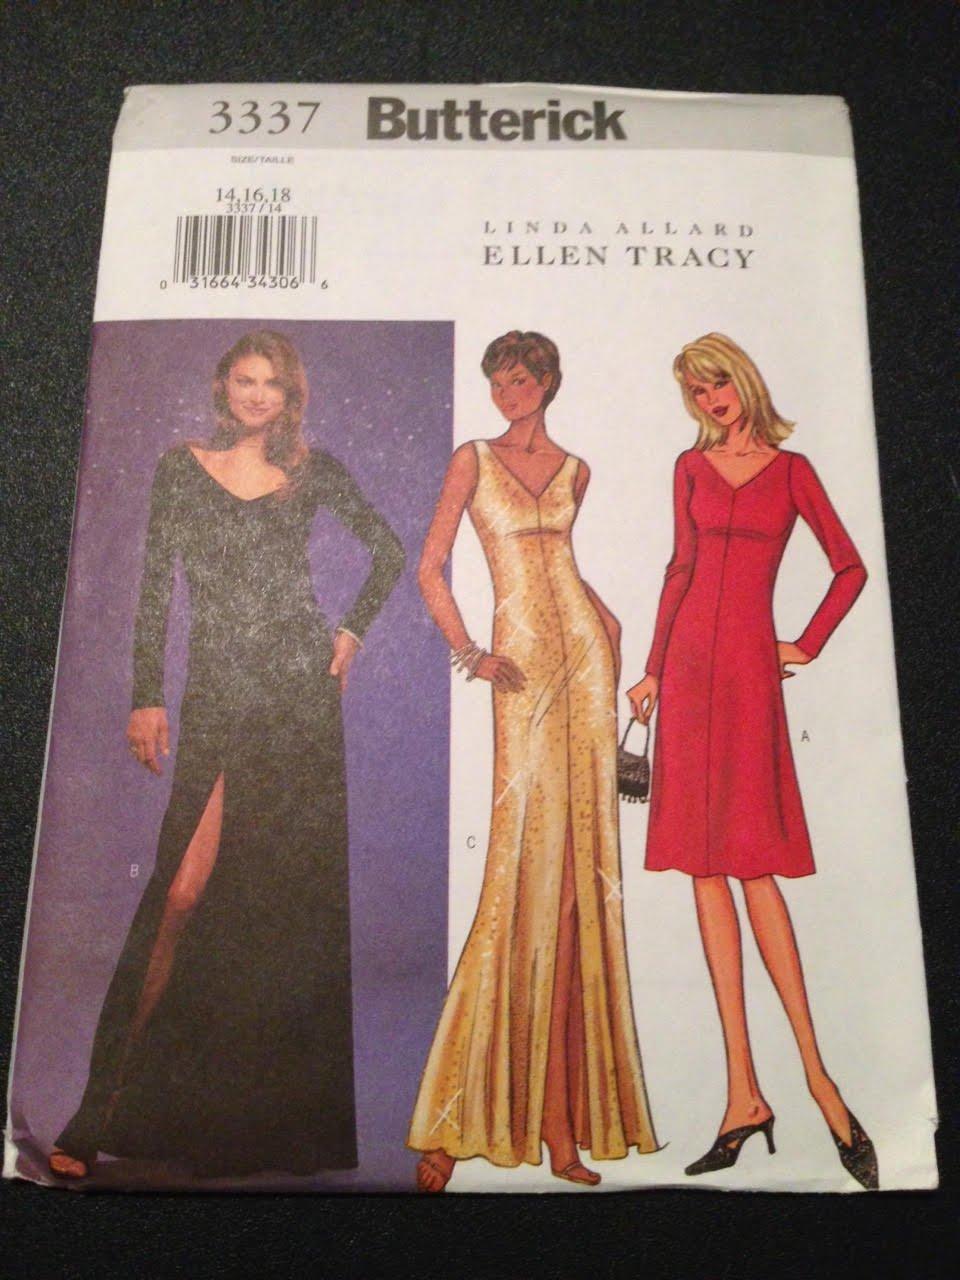 Butterick 3337 Sewing Pattern, Misses' Petite Dress,   Size 20,22,24